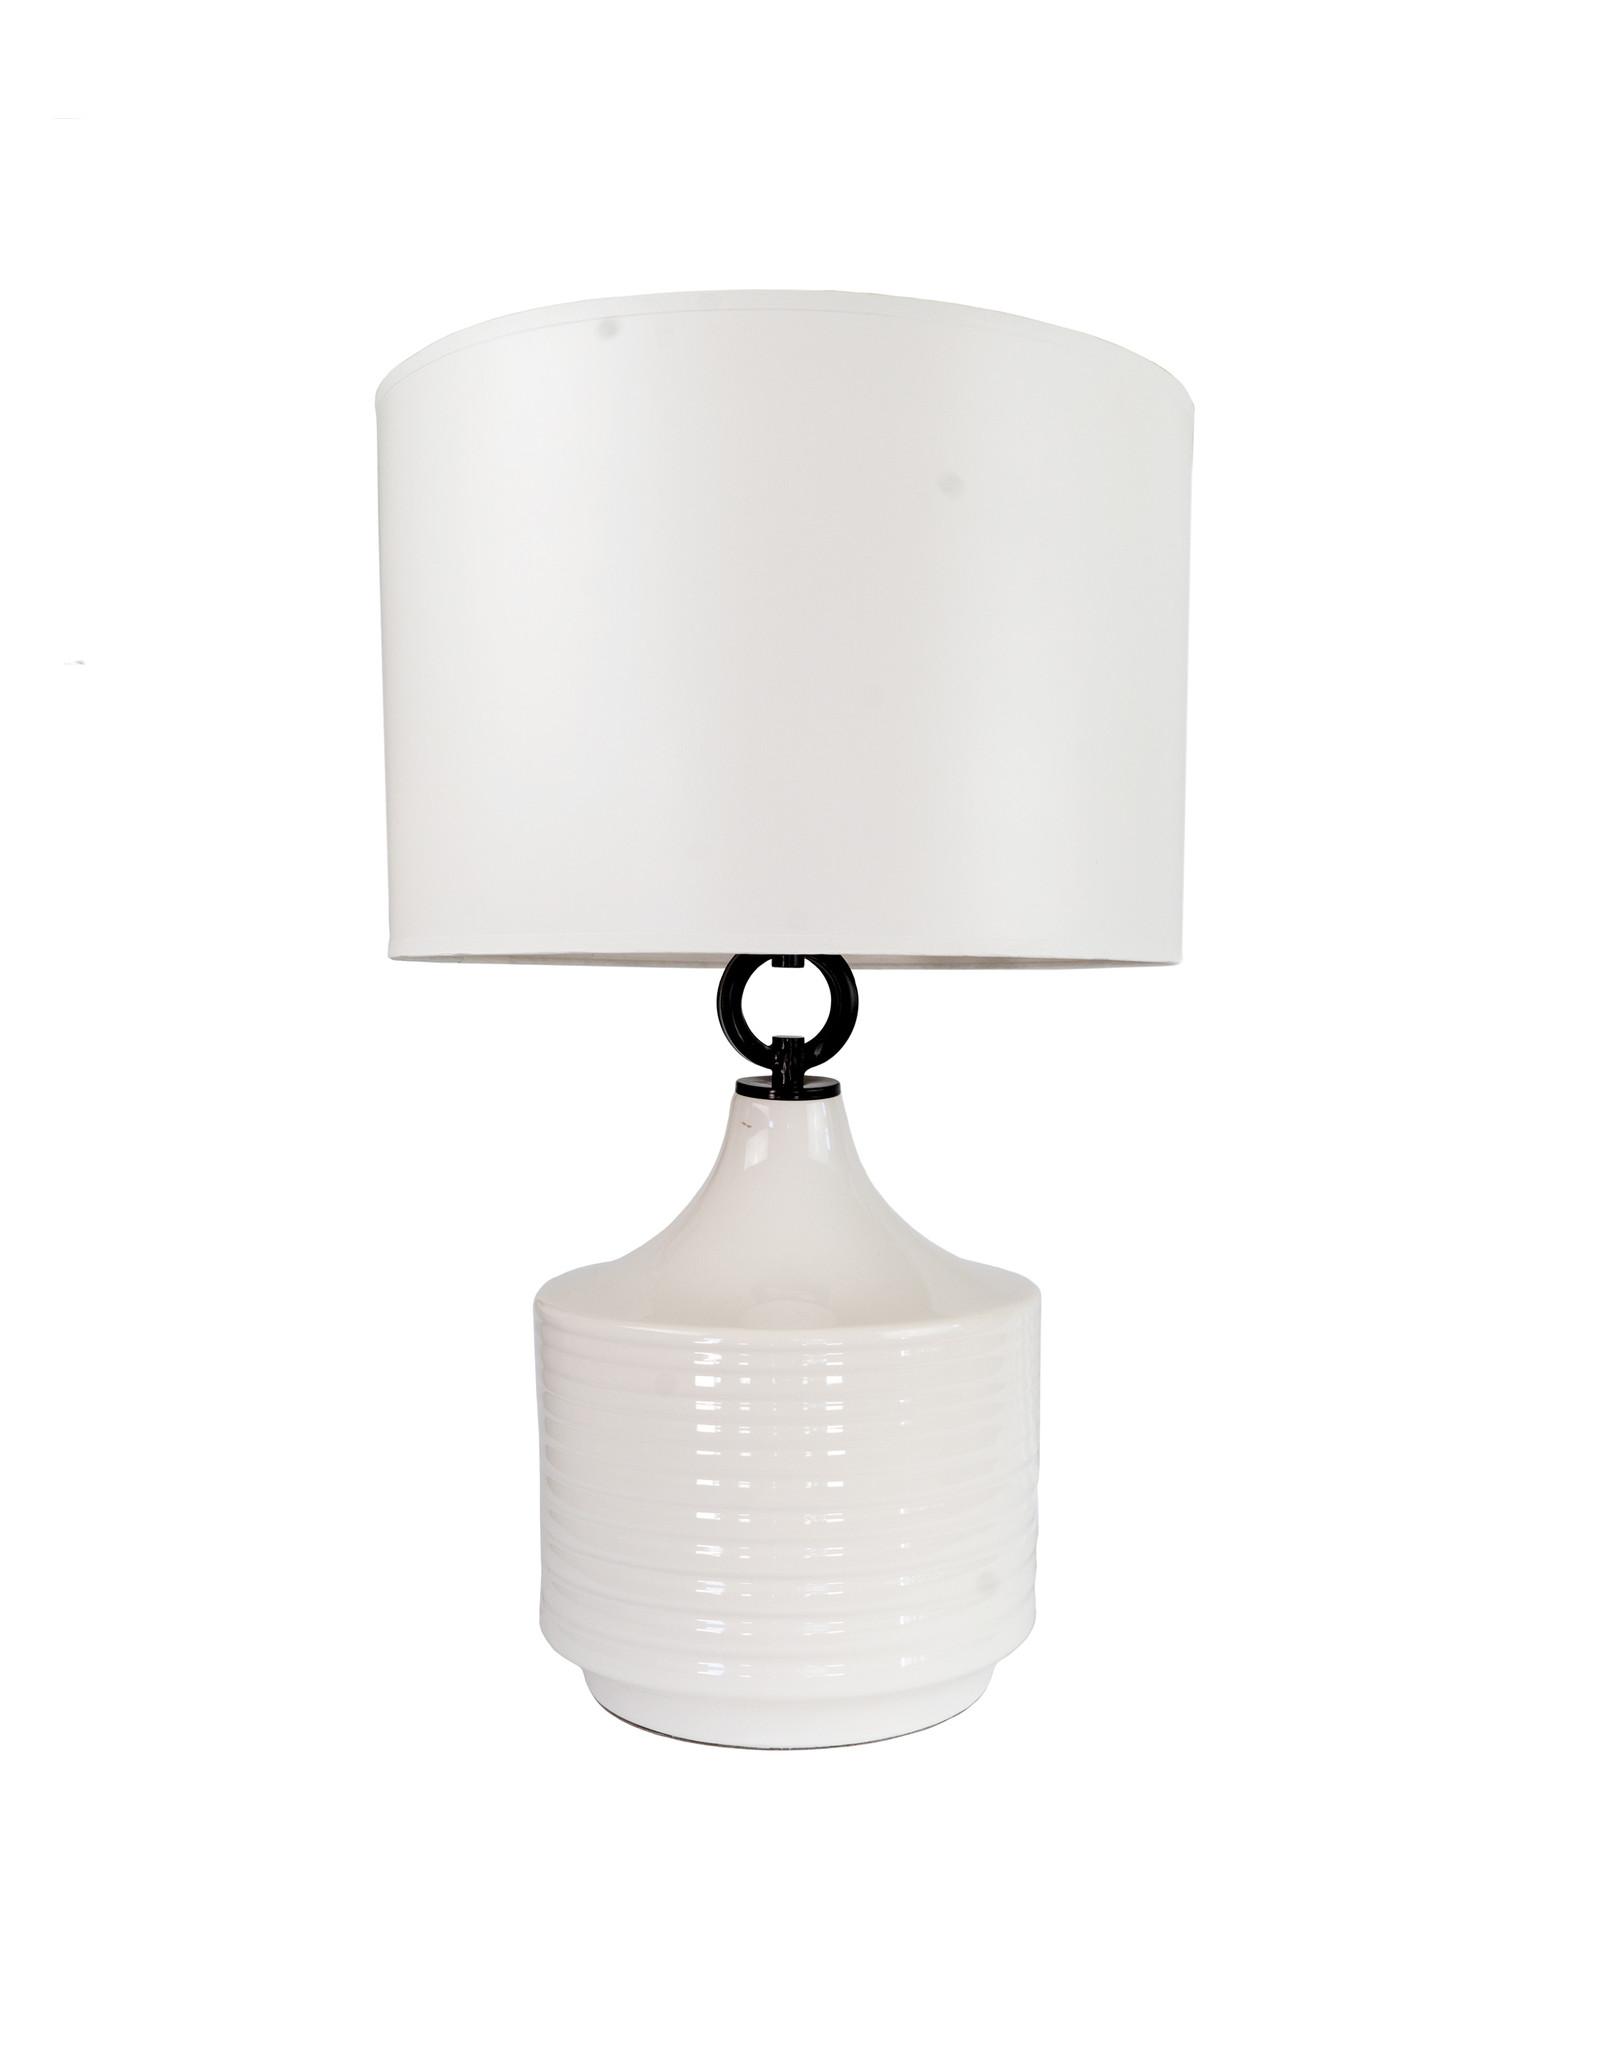 Accordion Lamp